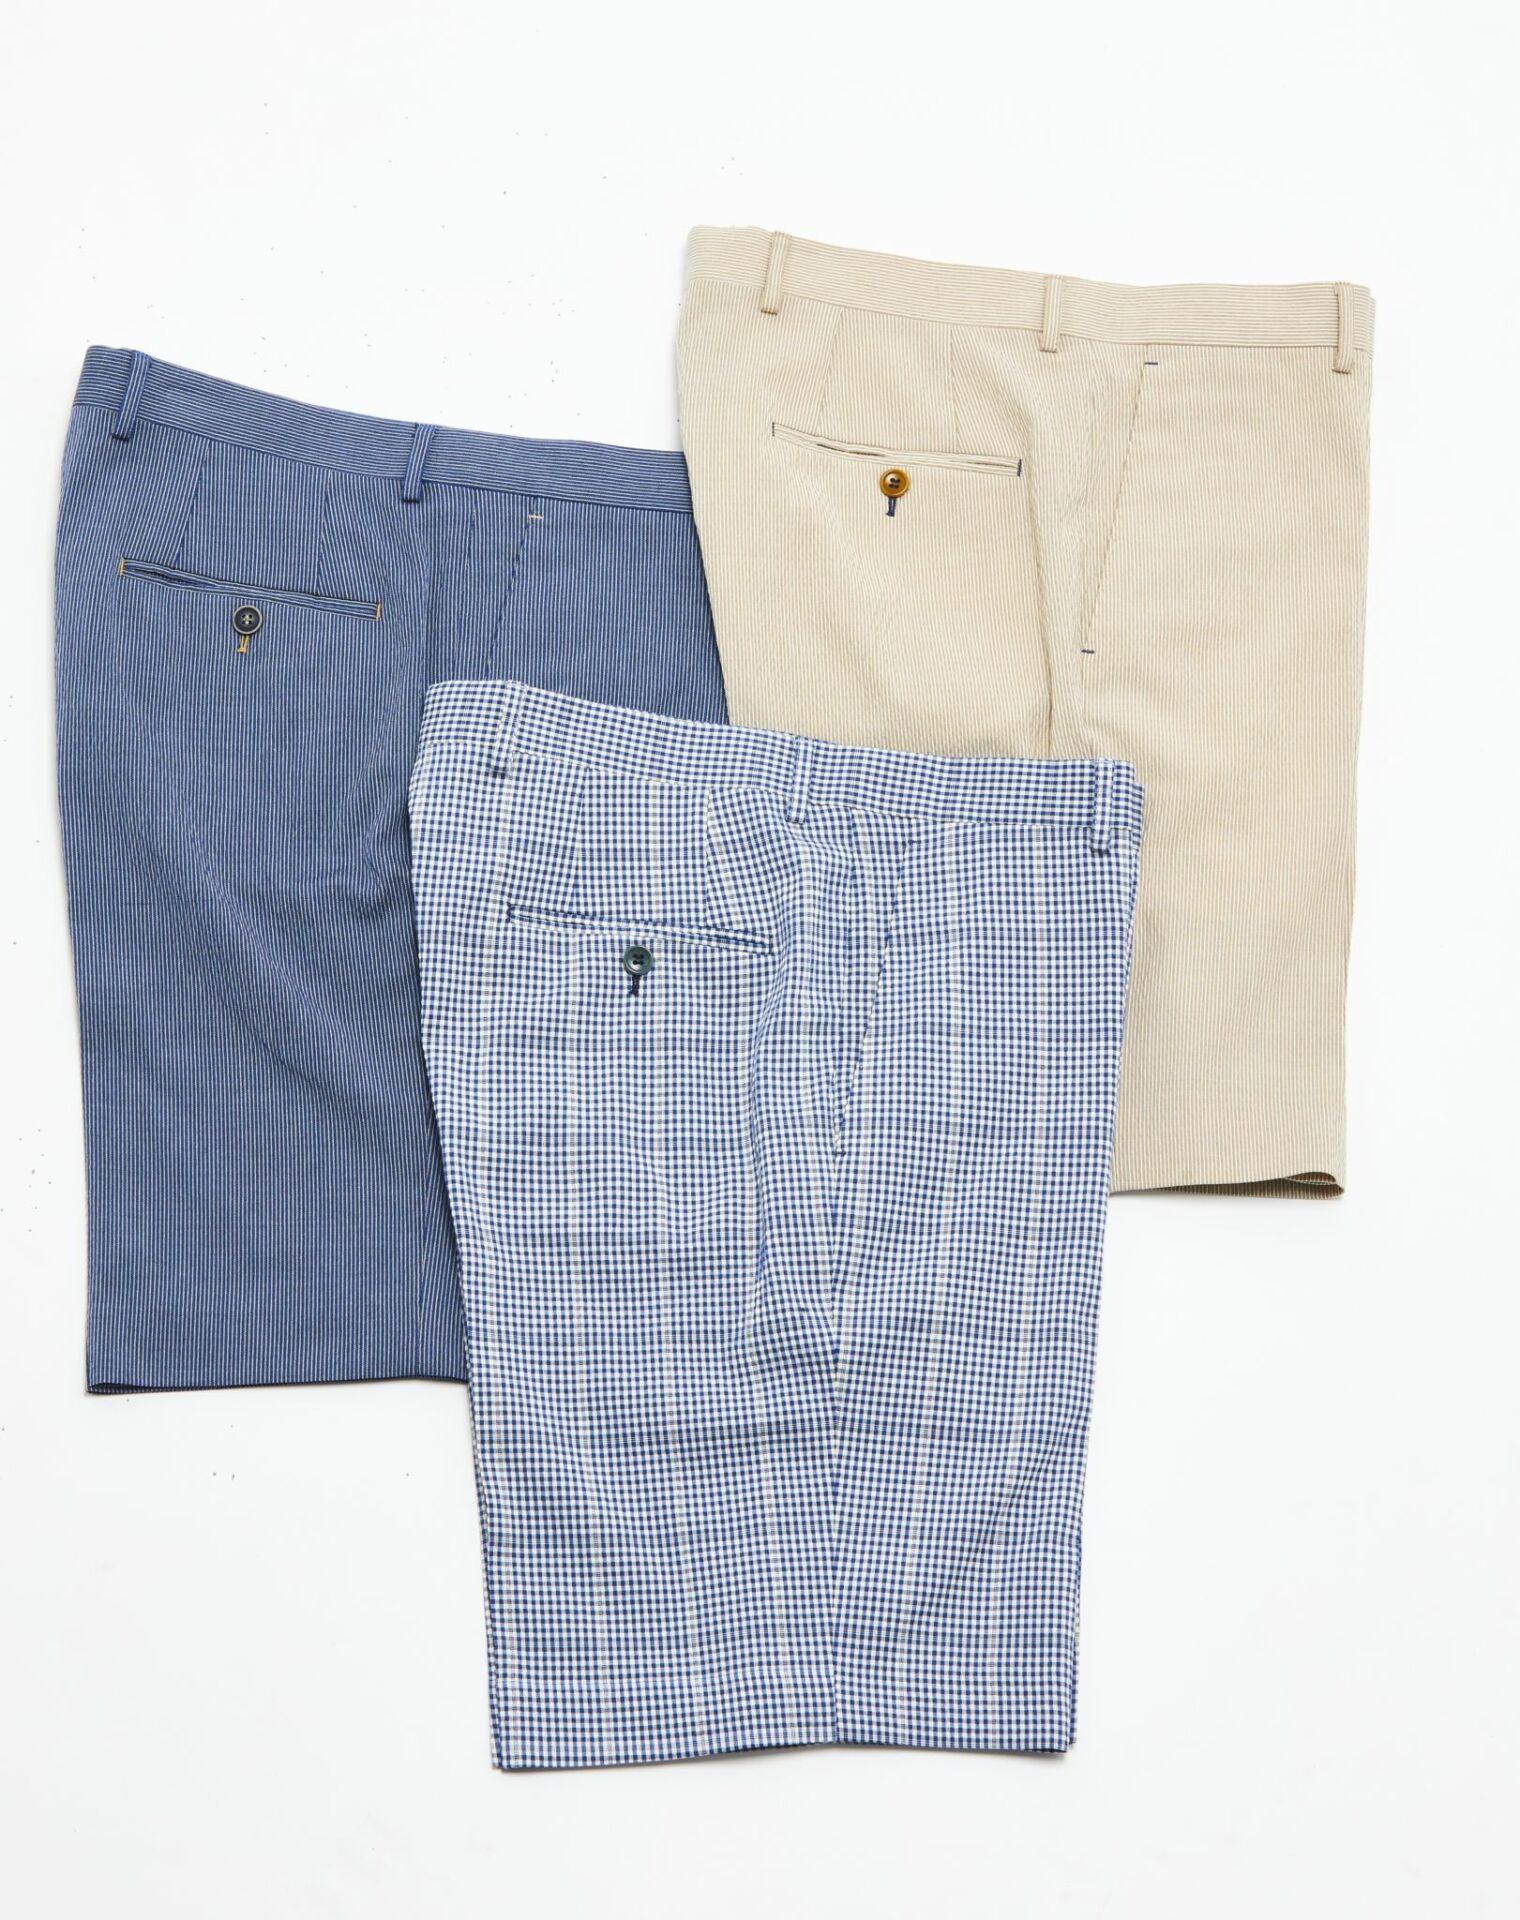 Custom pants and shorts